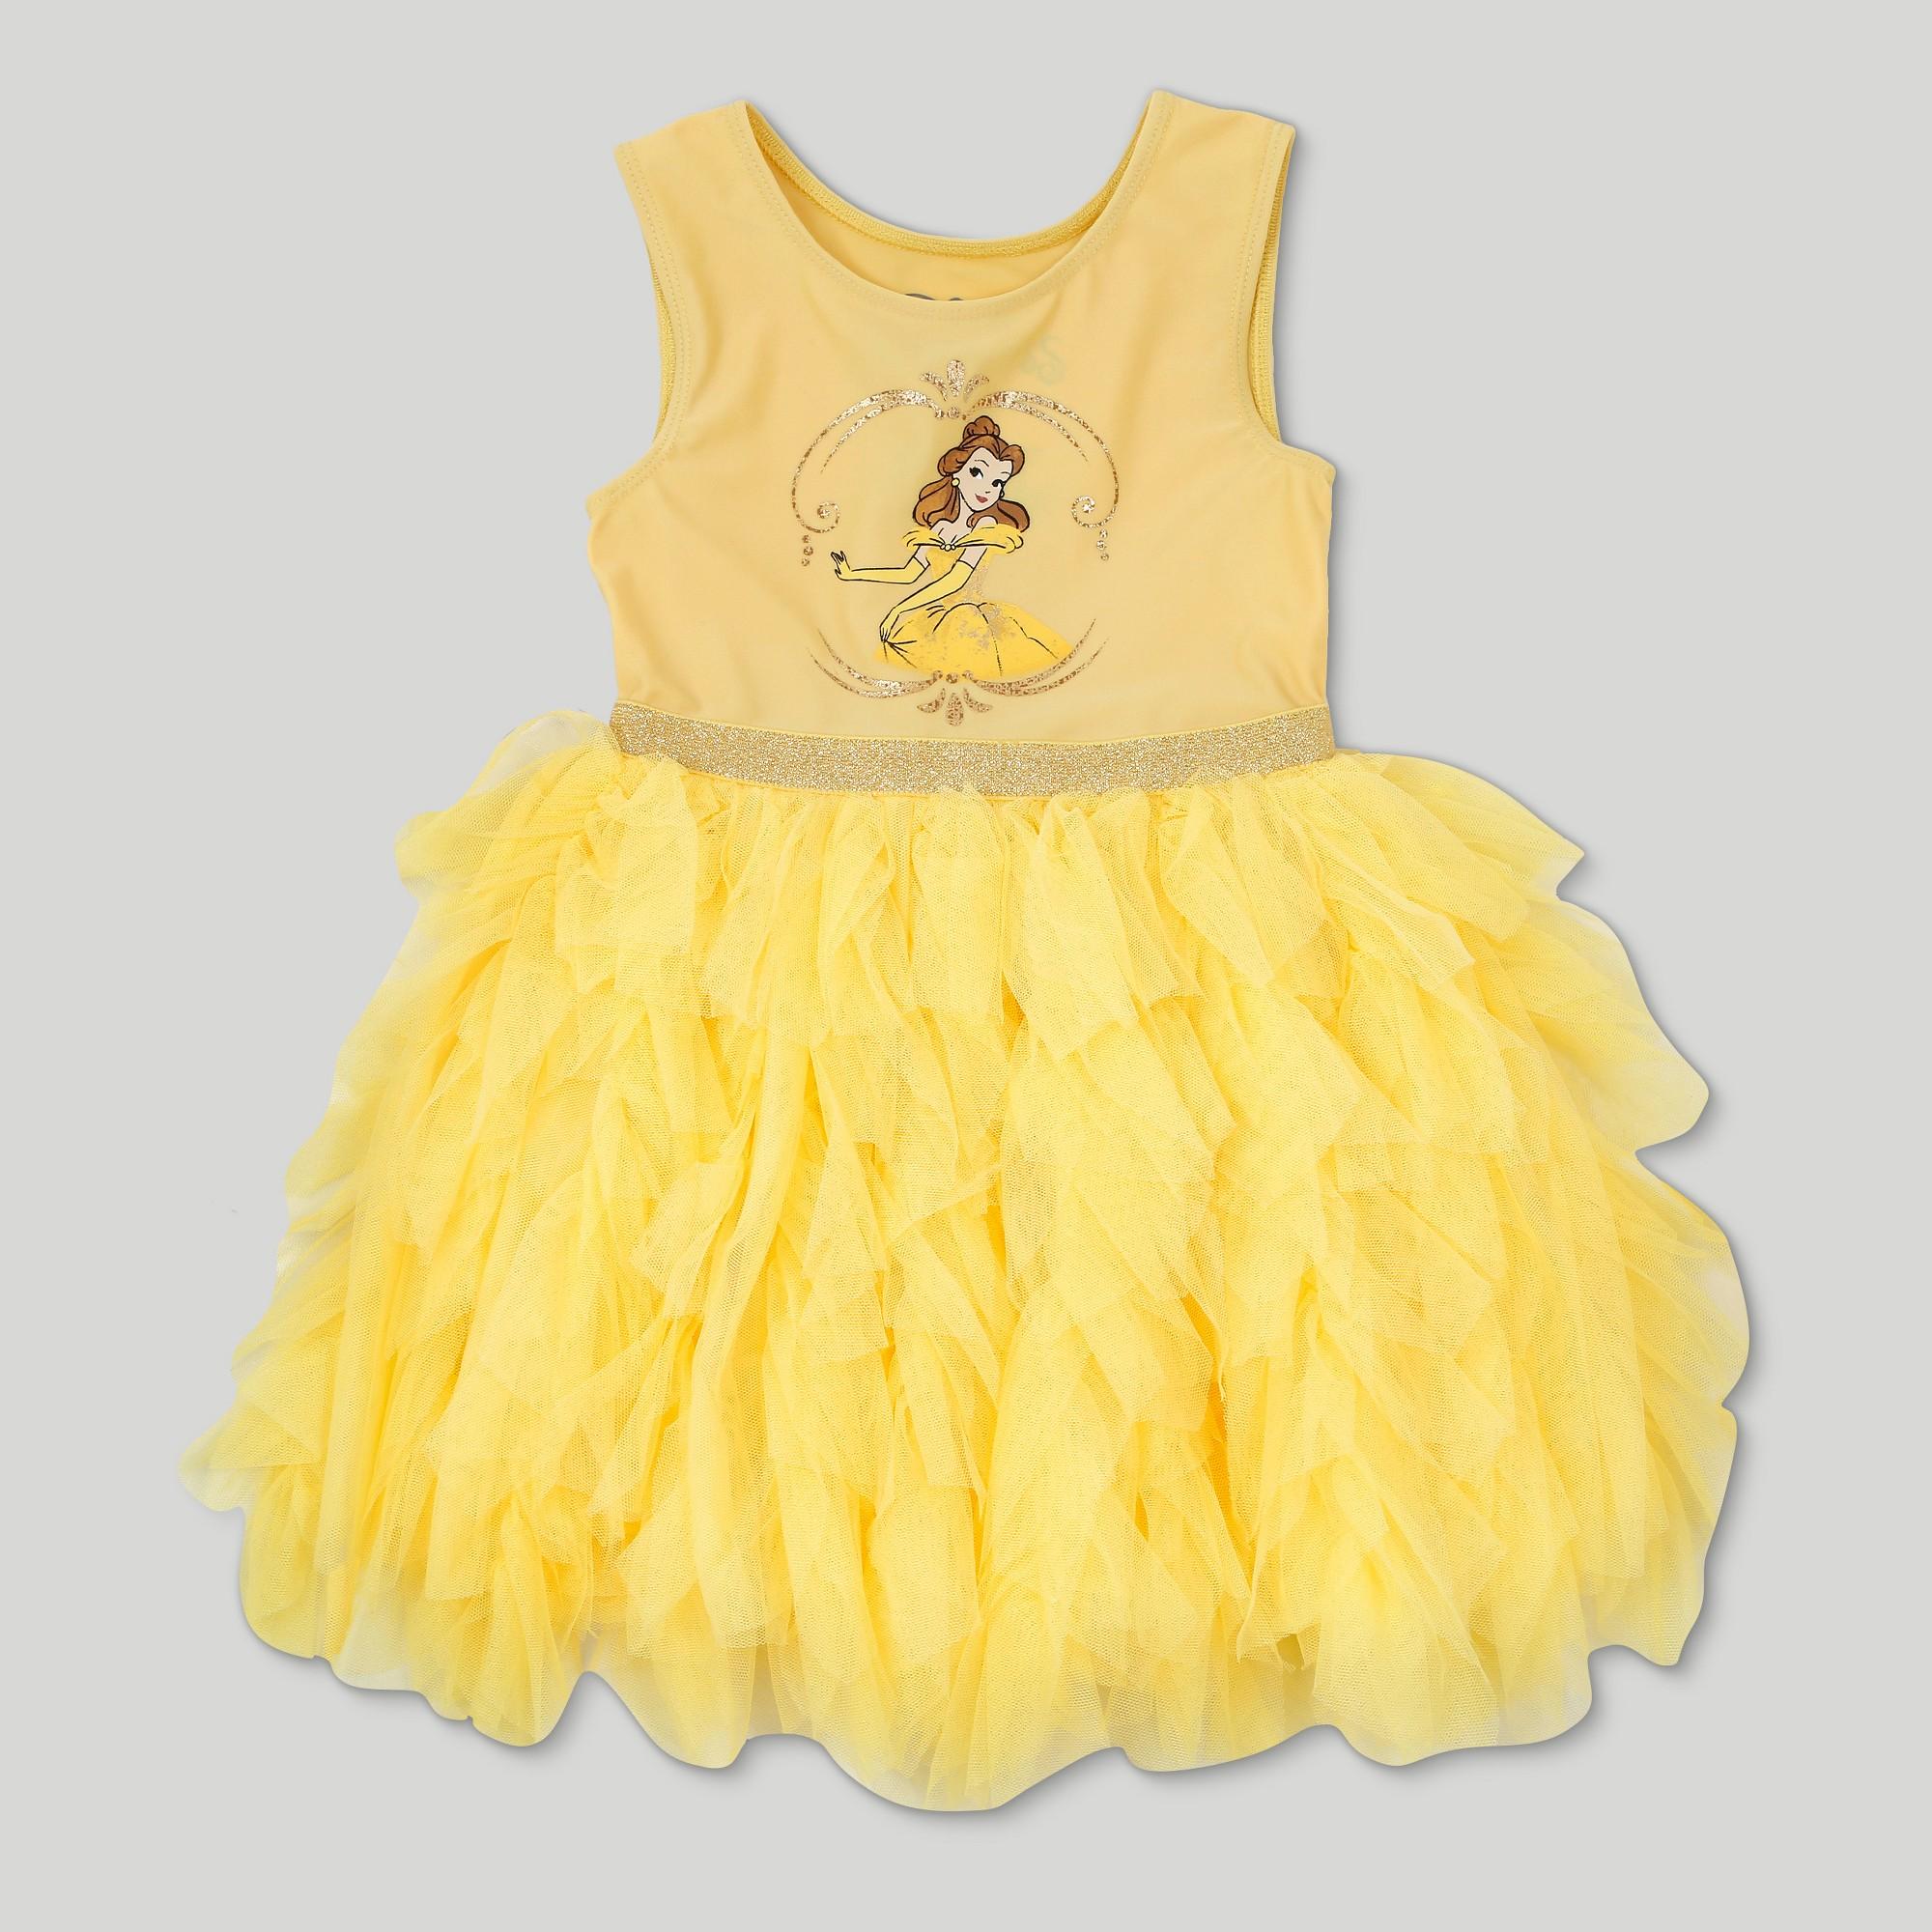 Yellow dress like belle  Toddler Girlsu Disney Beauty and the Beast Belle Sleeveless Tutu